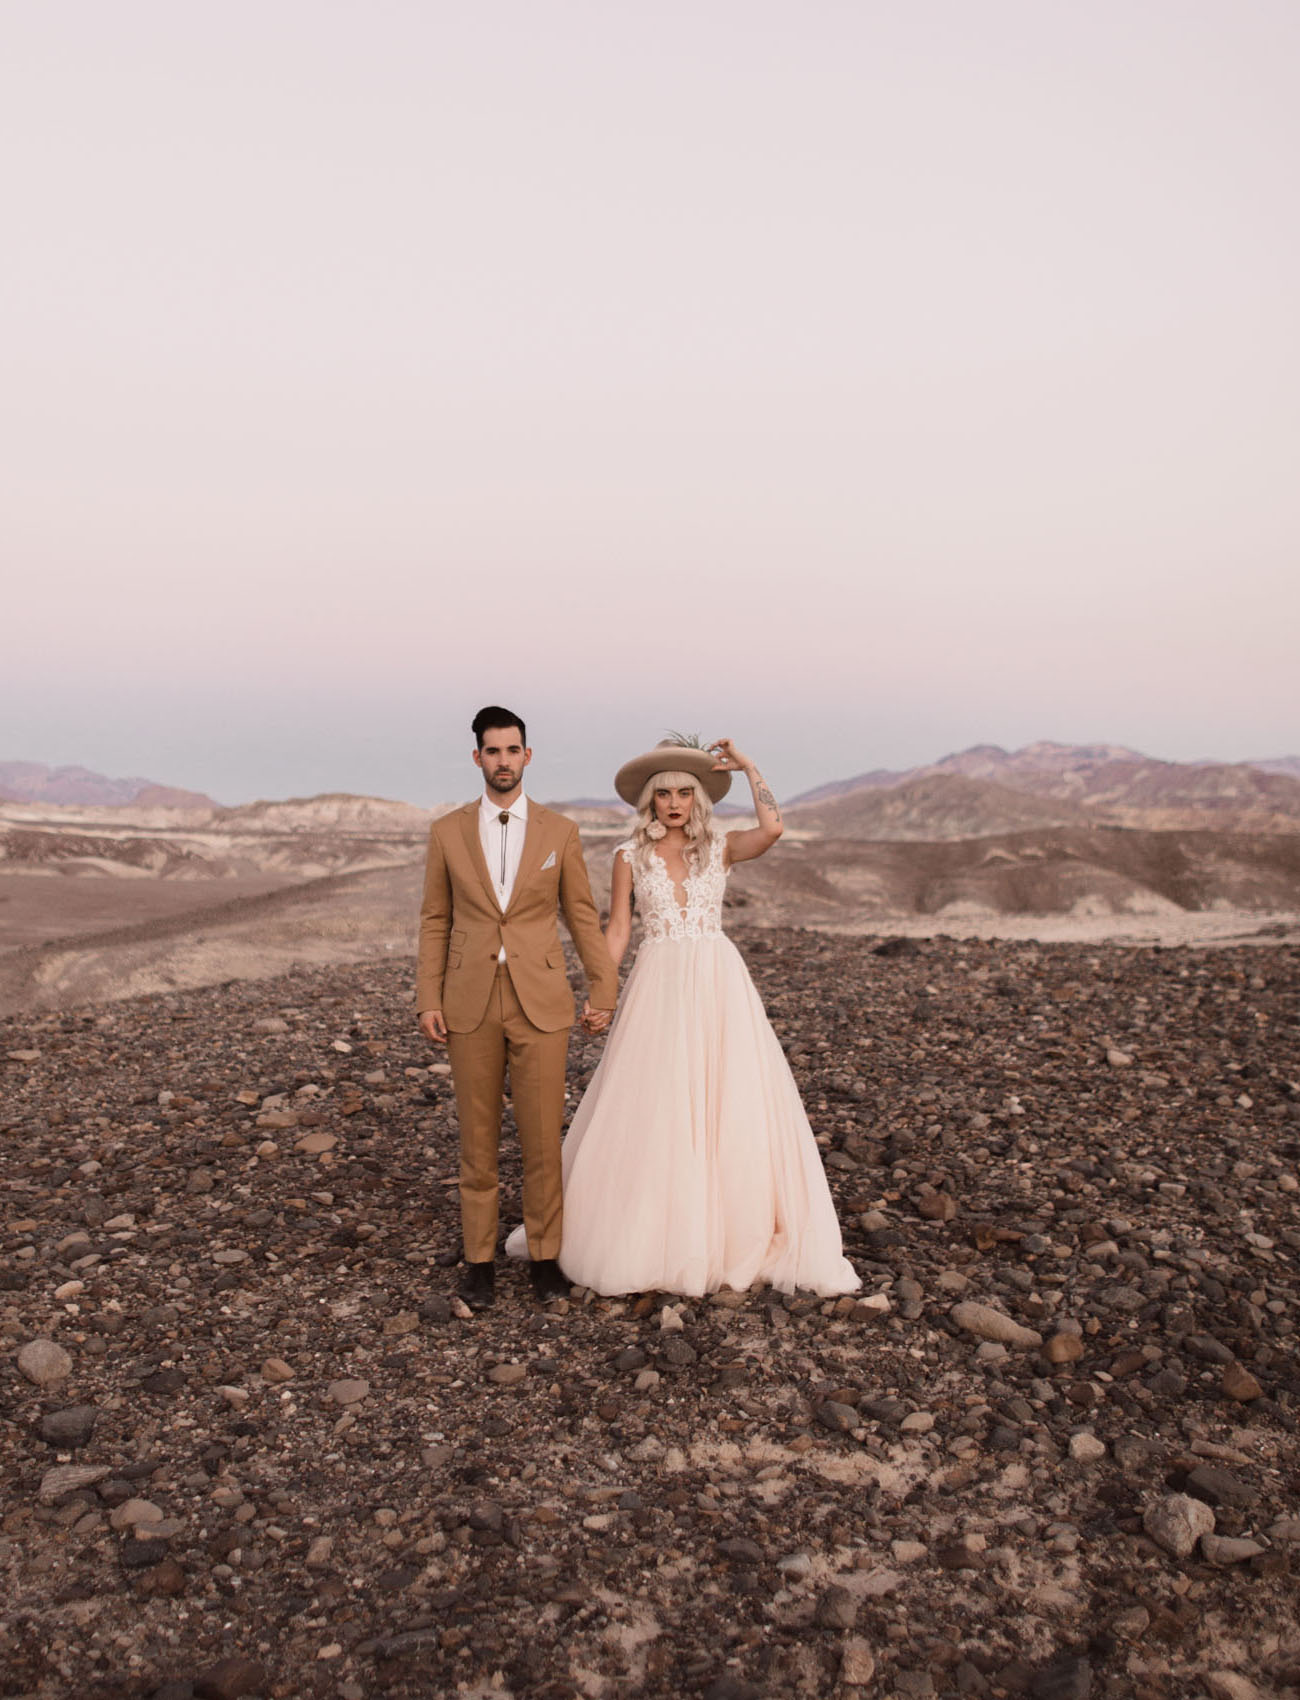 Wedding Dress Stores In Denver 96 Stunning a ub bridal shop